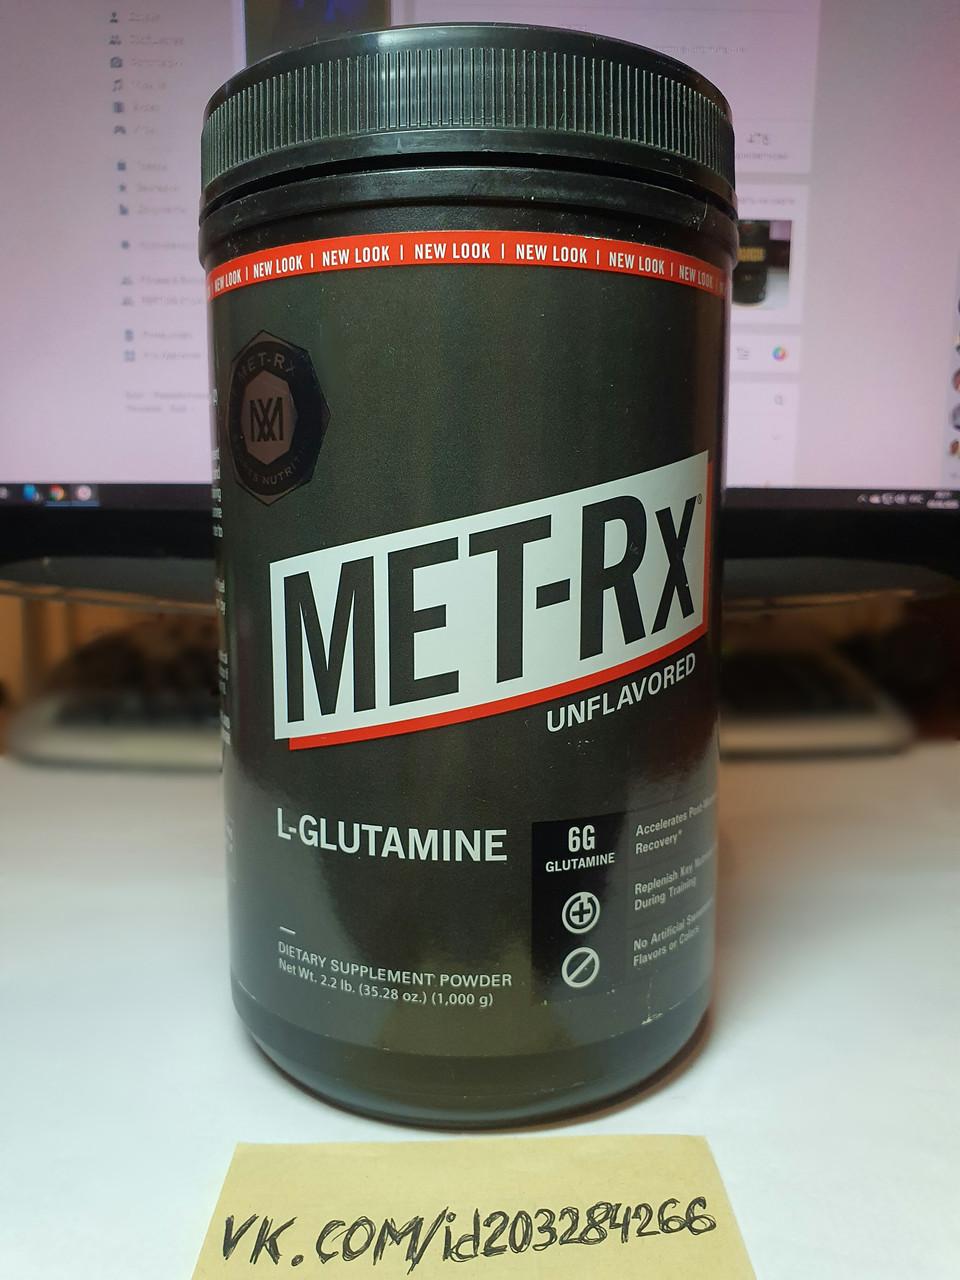 Глютамин Met-Rx L-Glutamine 1000g